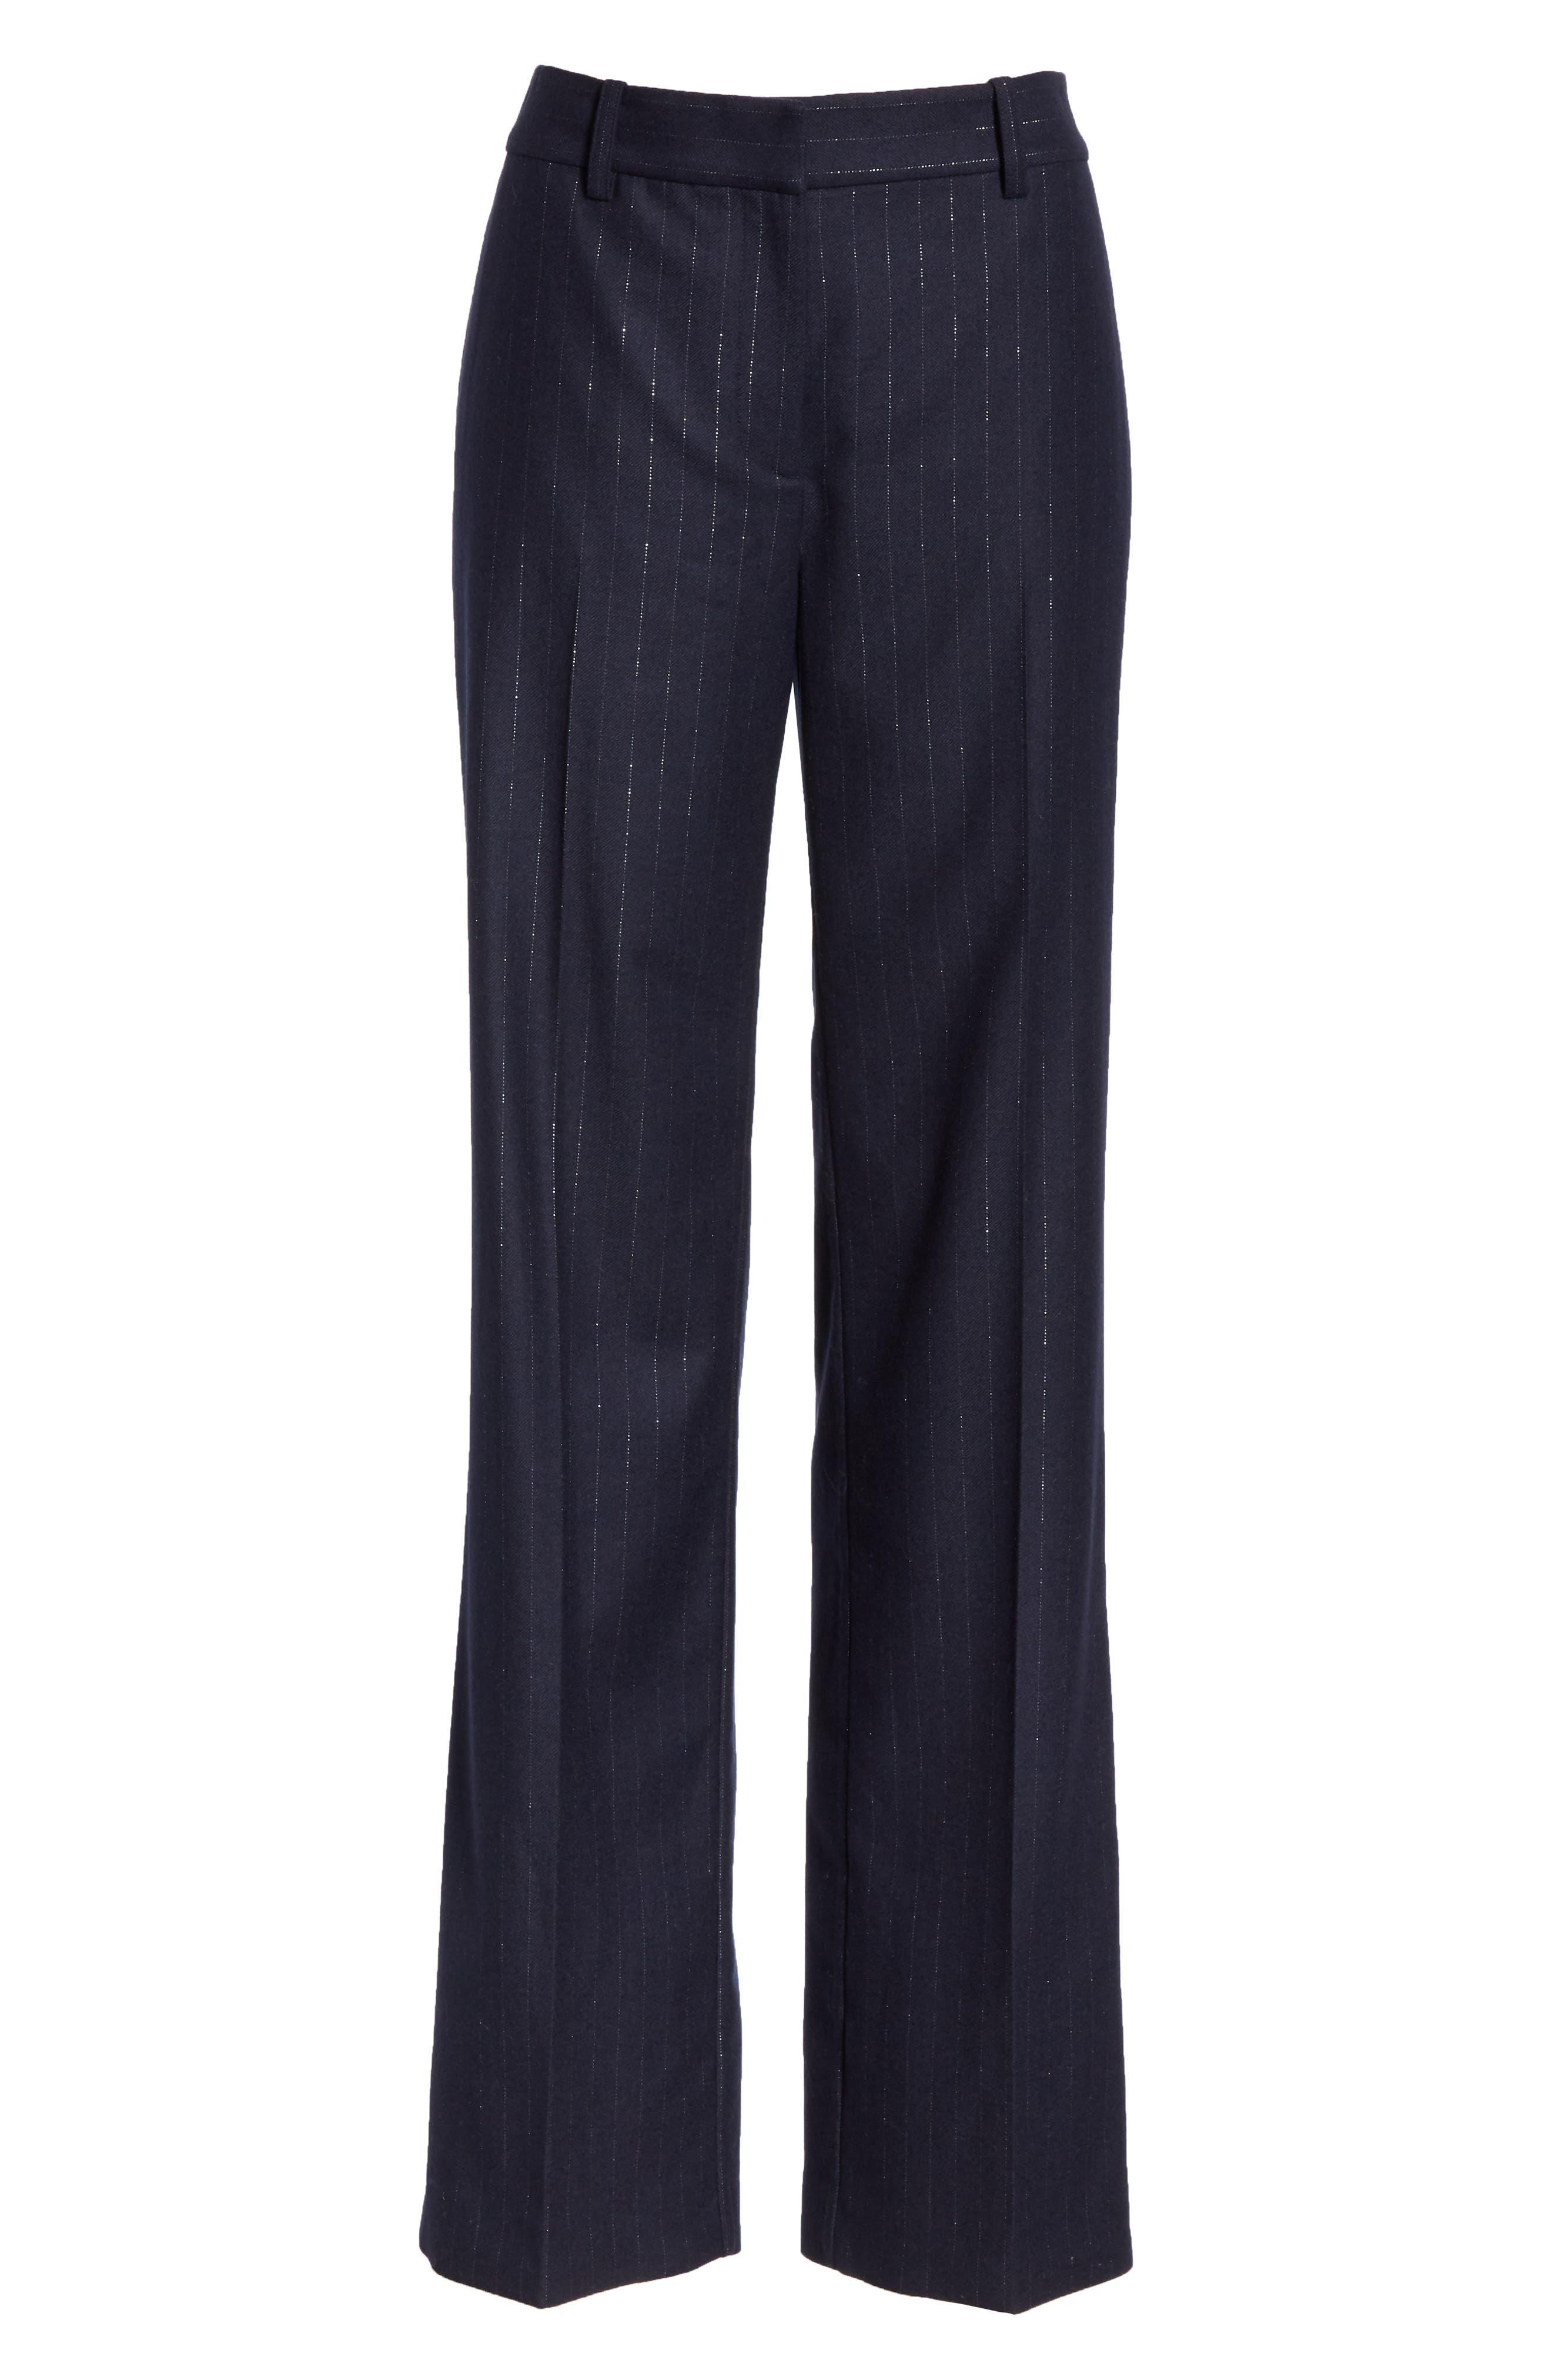 Hagan Trousers,                             Alternate thumbnail 7, color,                             NAVY